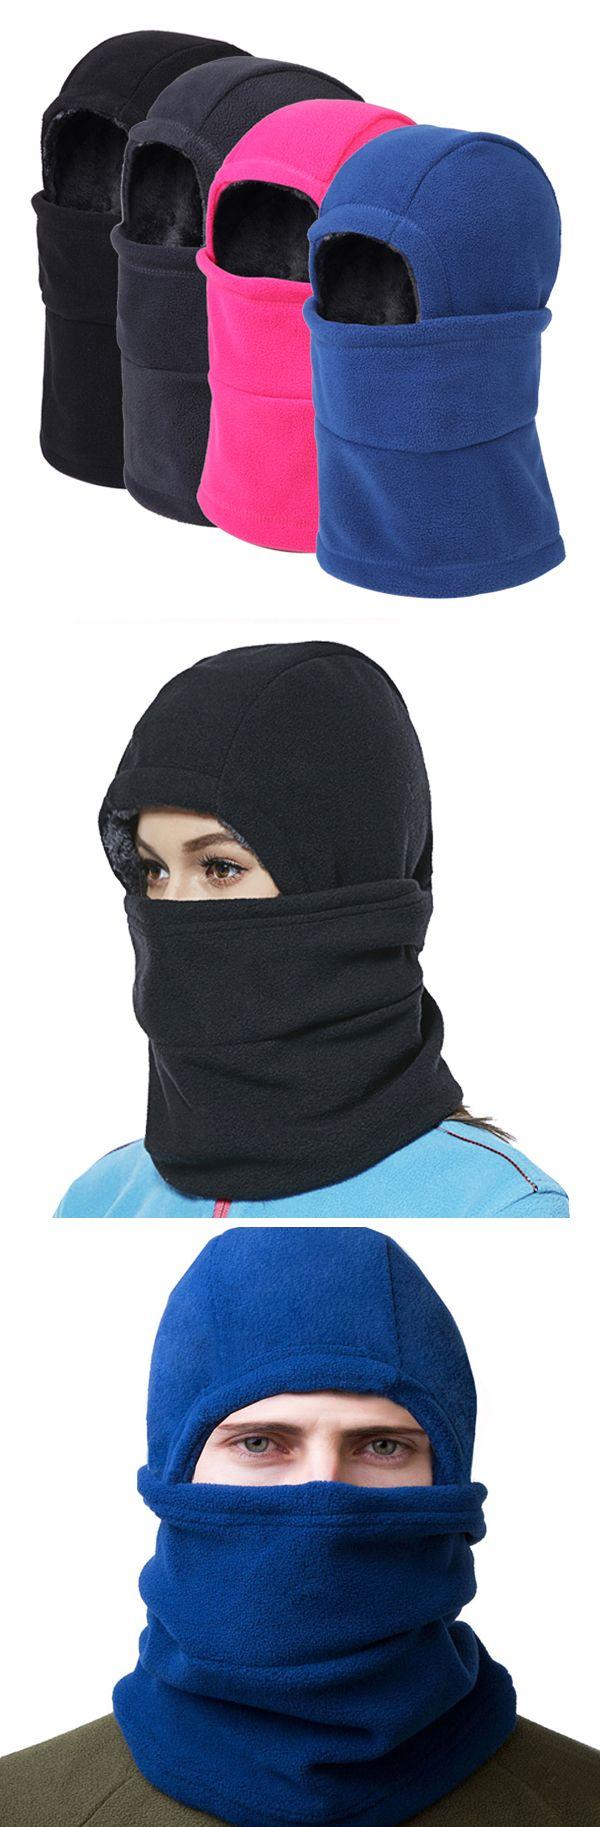 Men&Women Warm Head&Face&Ears Windproof Fleece Beanies Cap #outdoors #outfits